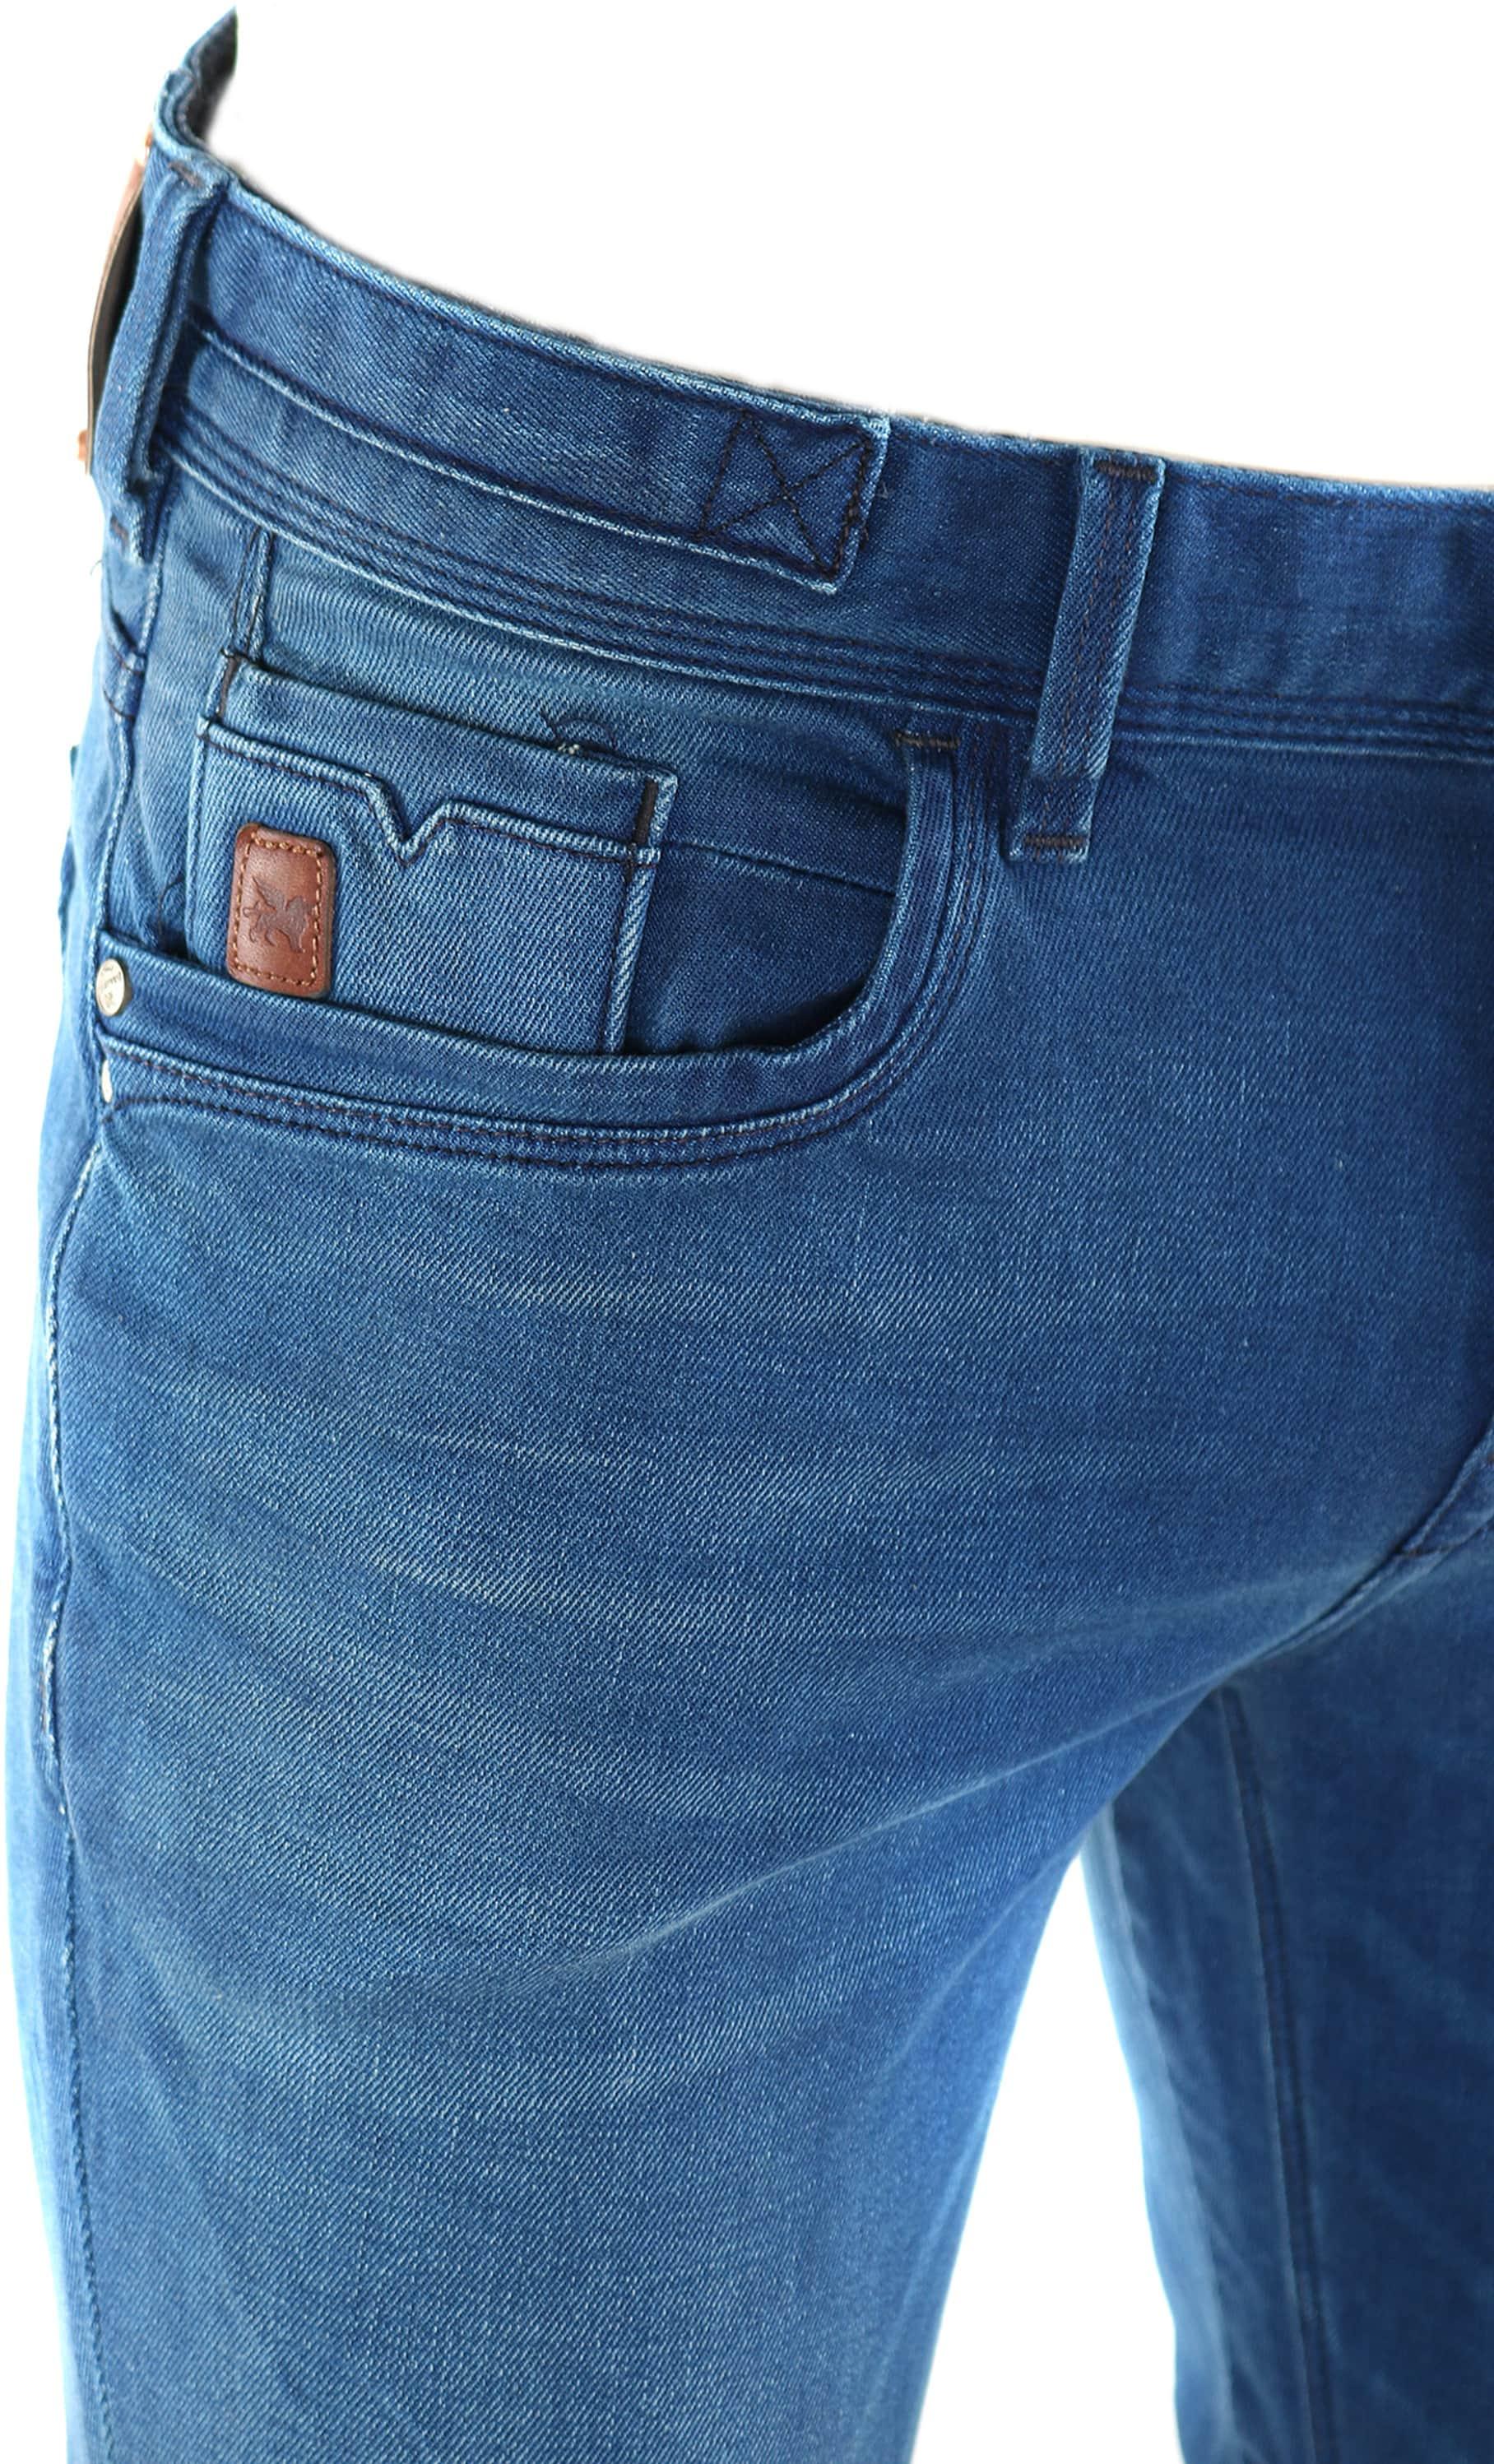 Vanguard V8 Jeans Blau foto 1